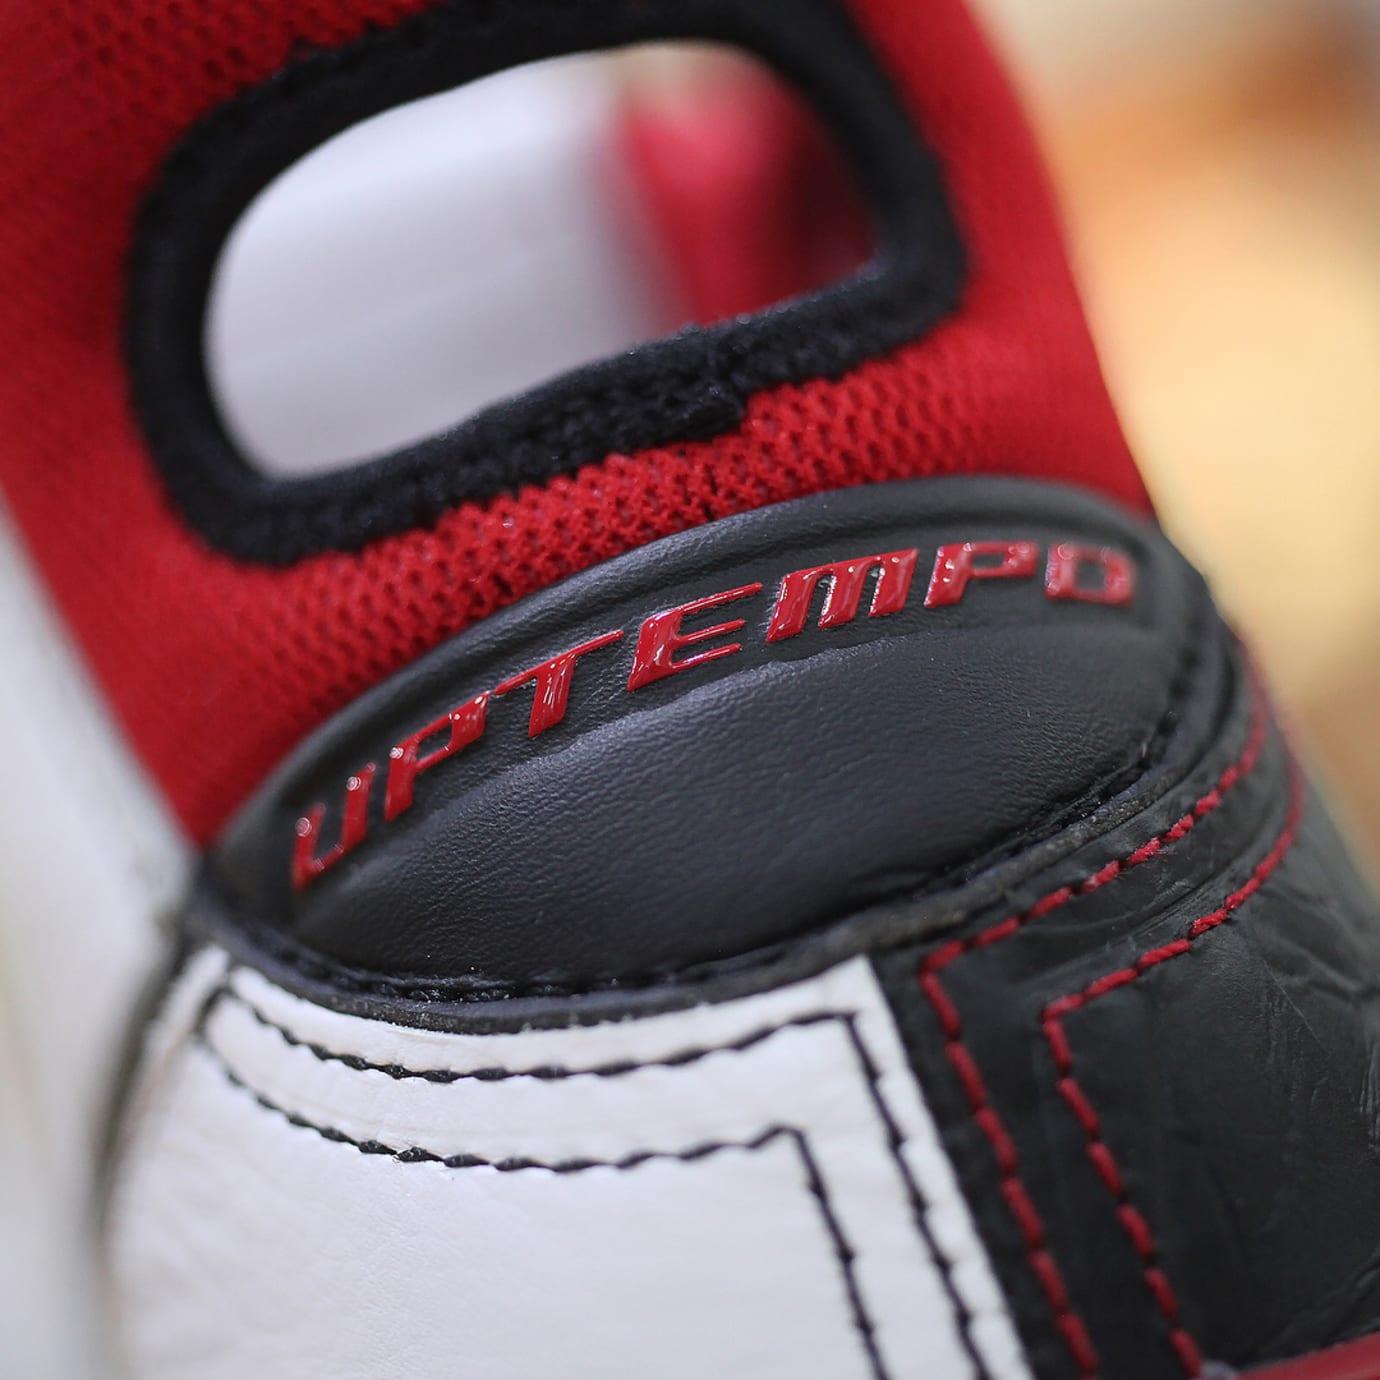 Nike Zoom Kobe 1 Protro All-Star Release Date AQ2728-102 Heel Detail